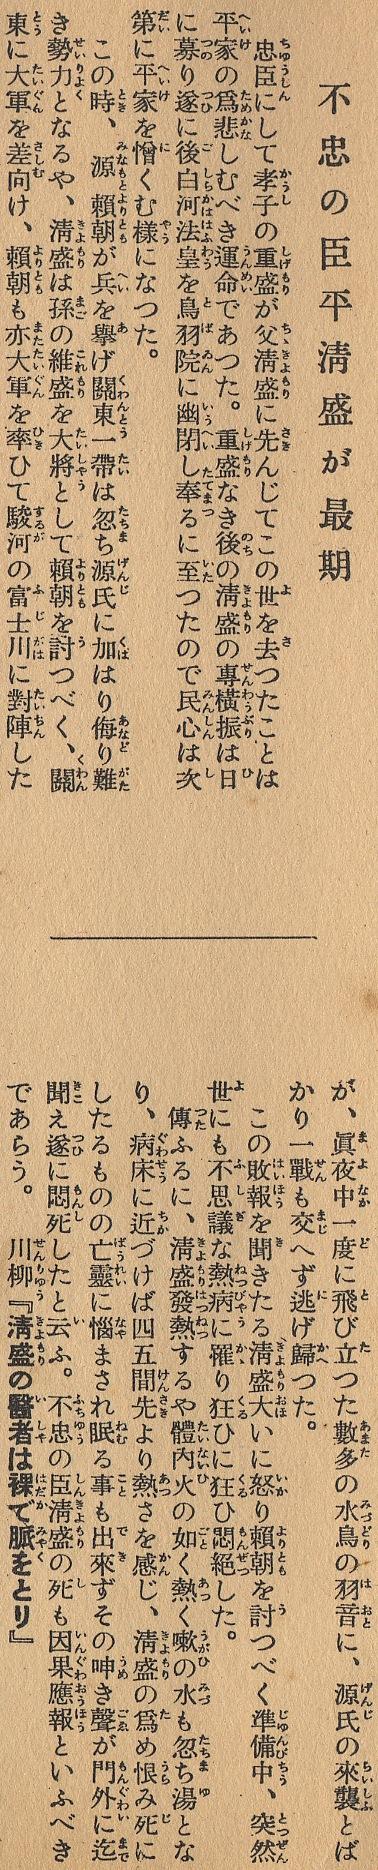 19_fuchunosin_tairanokiyomorigasaigo_ex.jpg